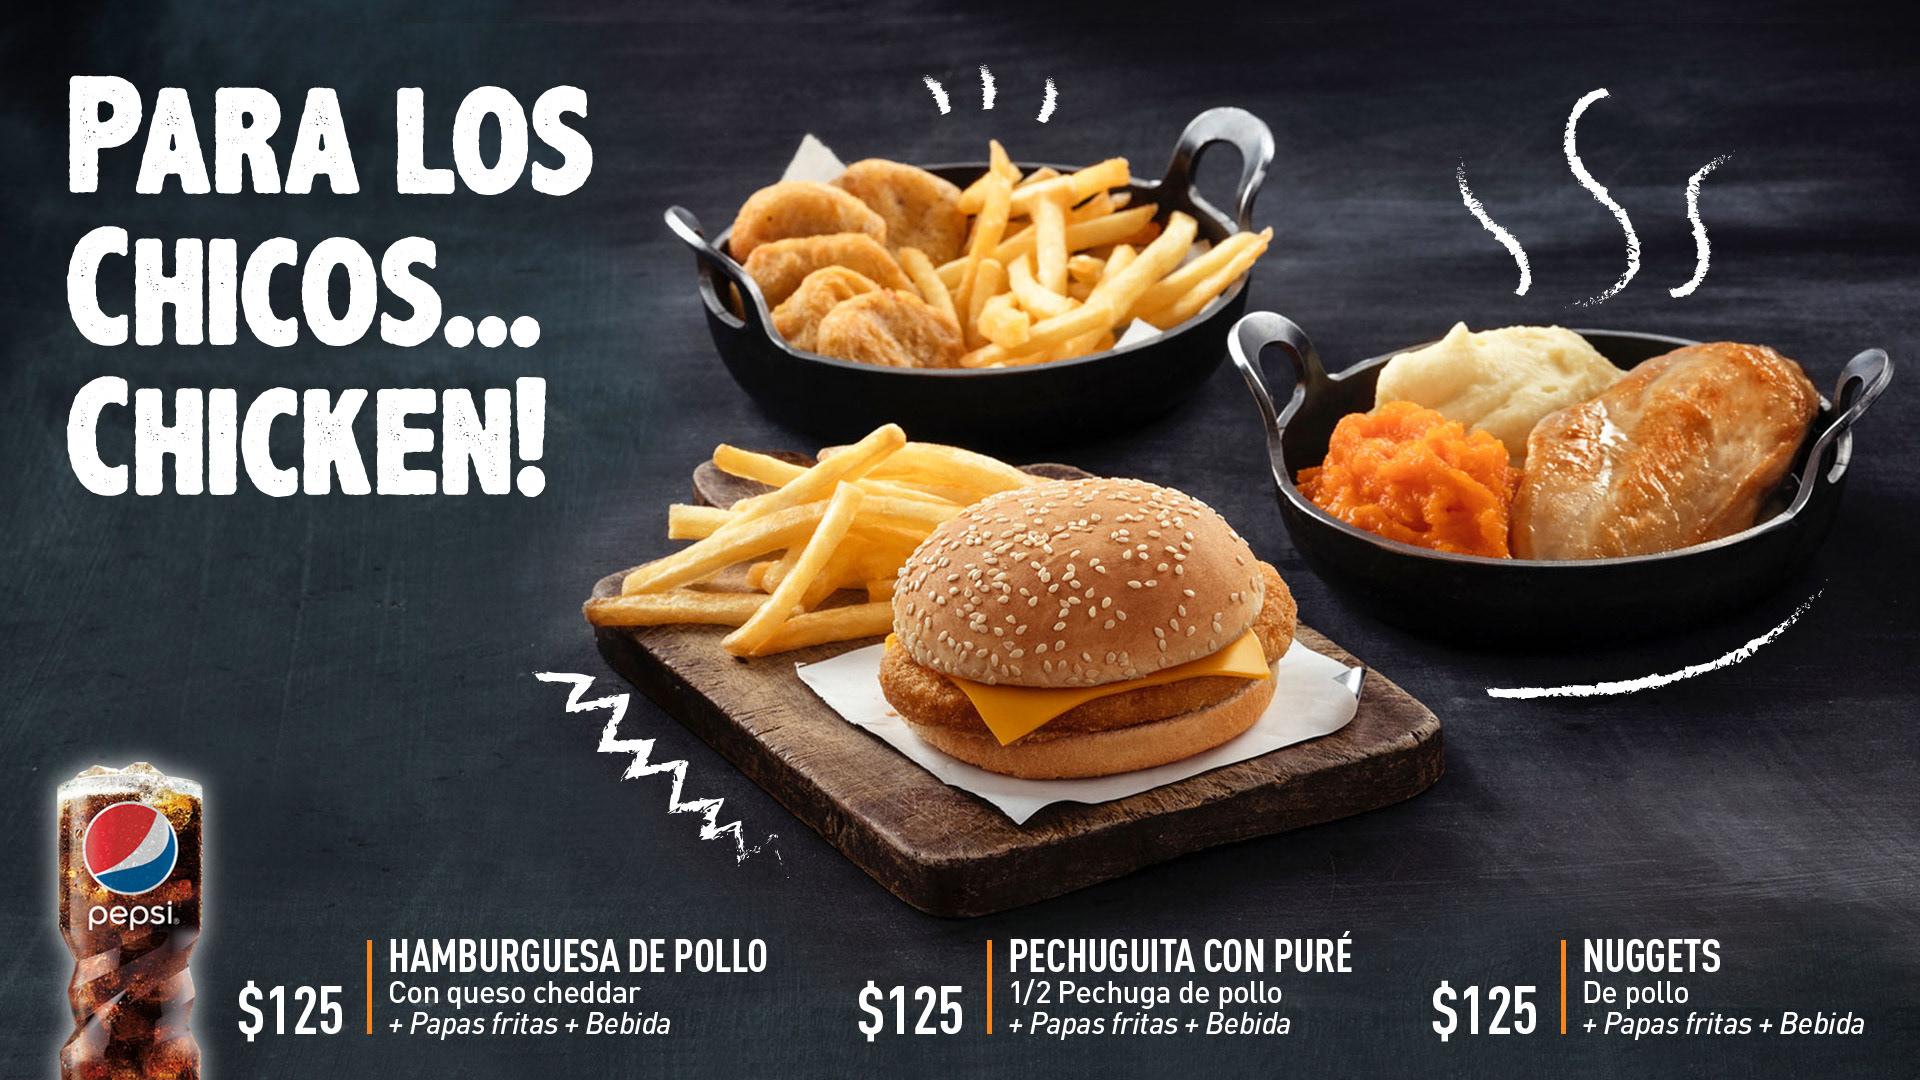 fernanda bonserio - ave caesar (fast food)